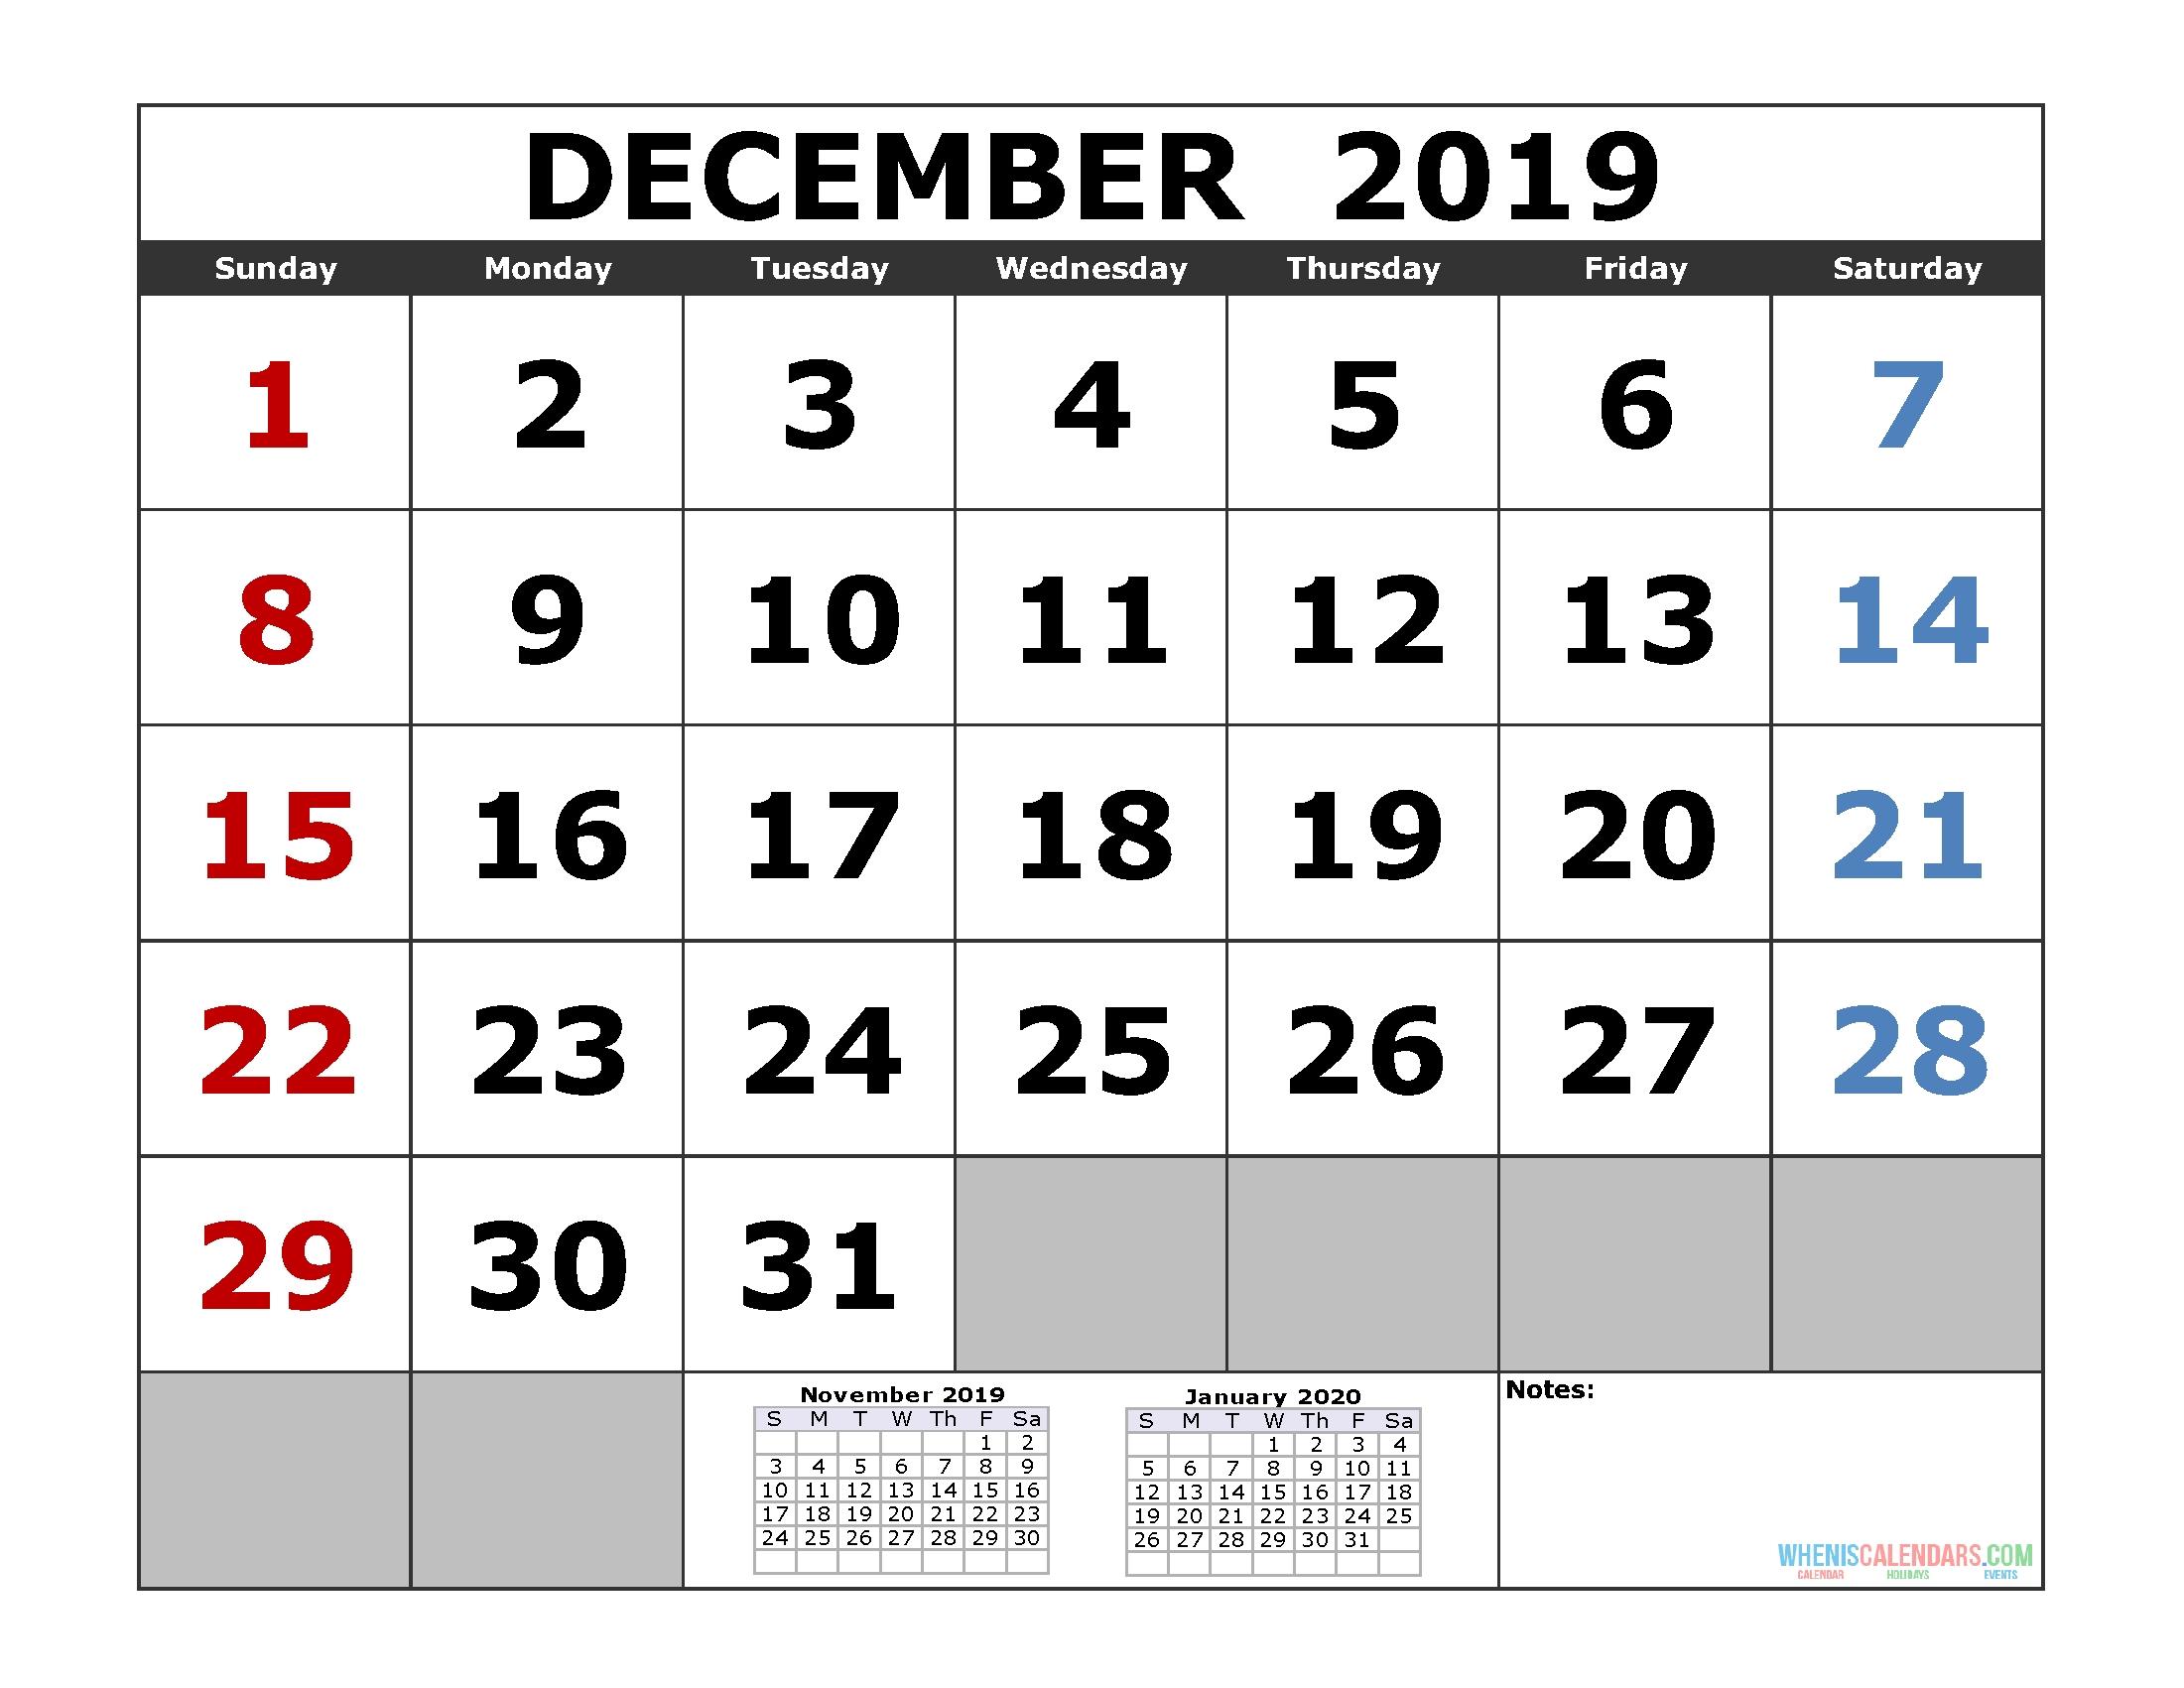 Free December 2019 Printable Calendar Templates [Us. Edition